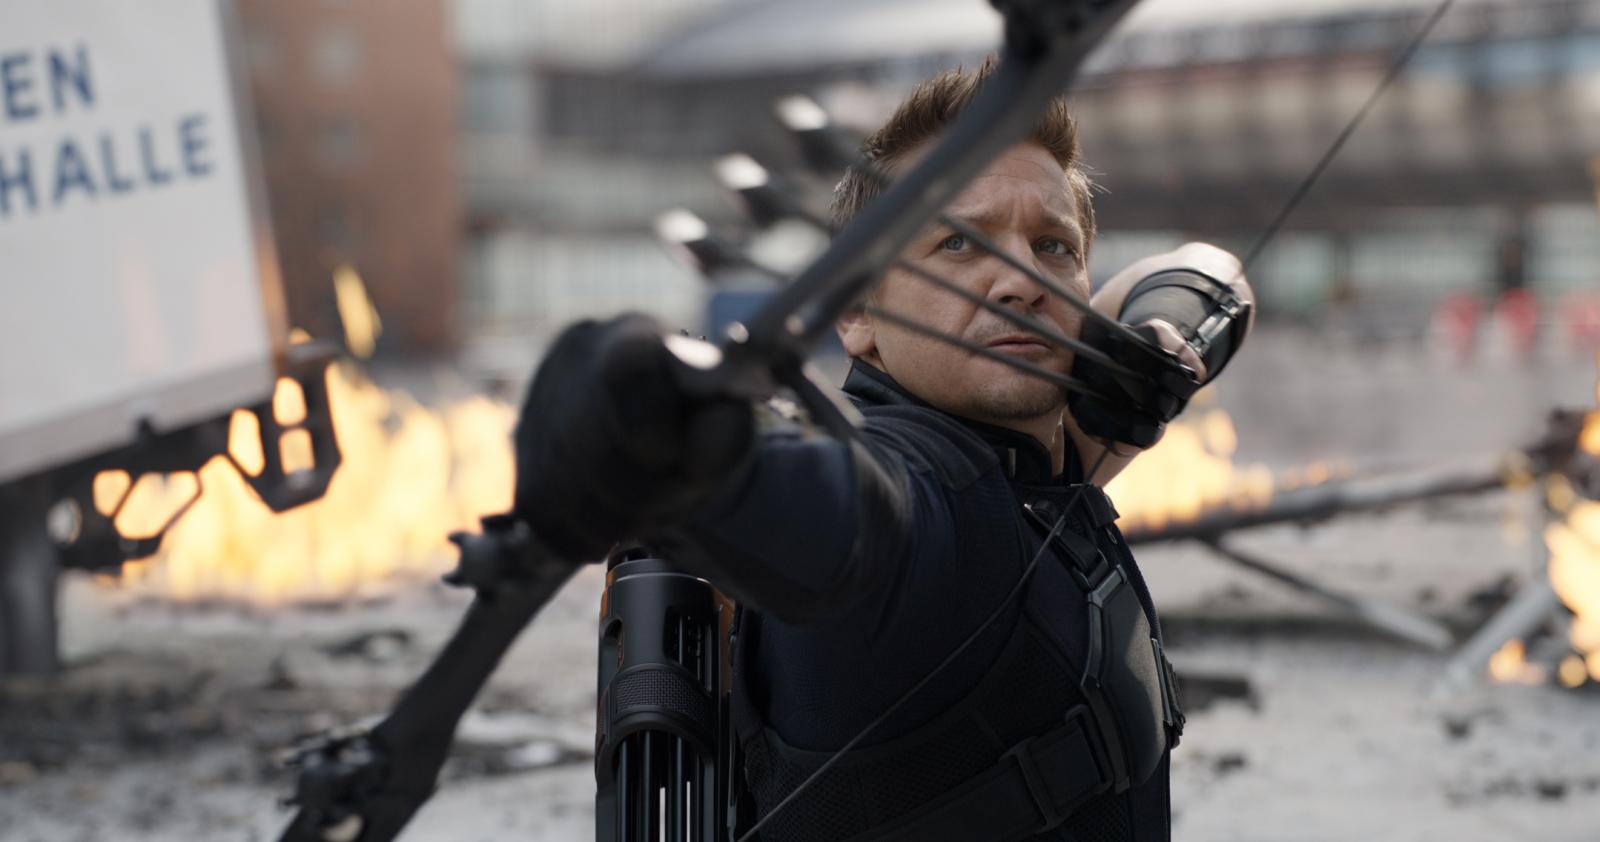 Jeremy Renner in Captain America: Civil War